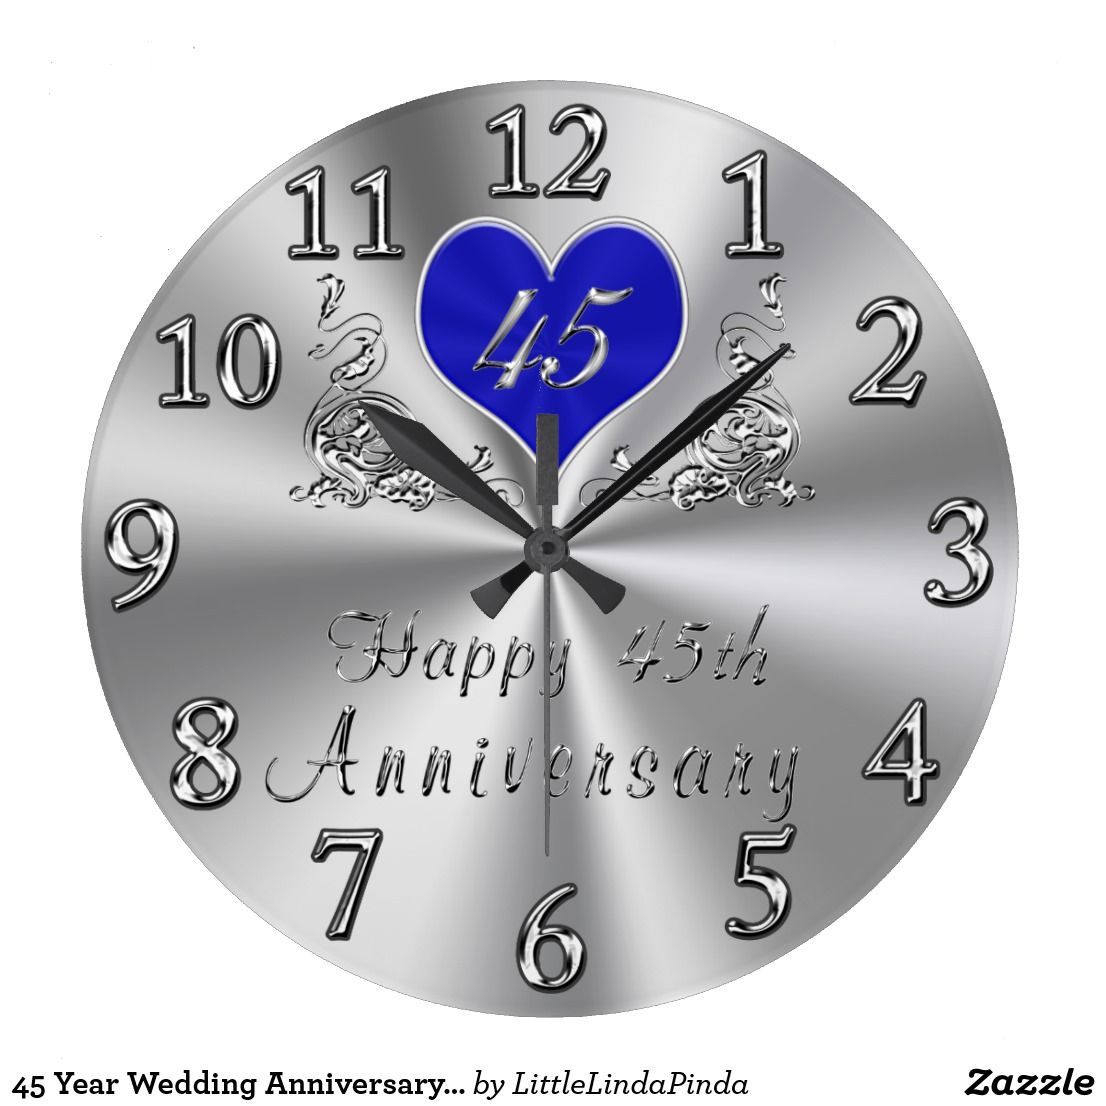 45th wedding anniversary gifts uk